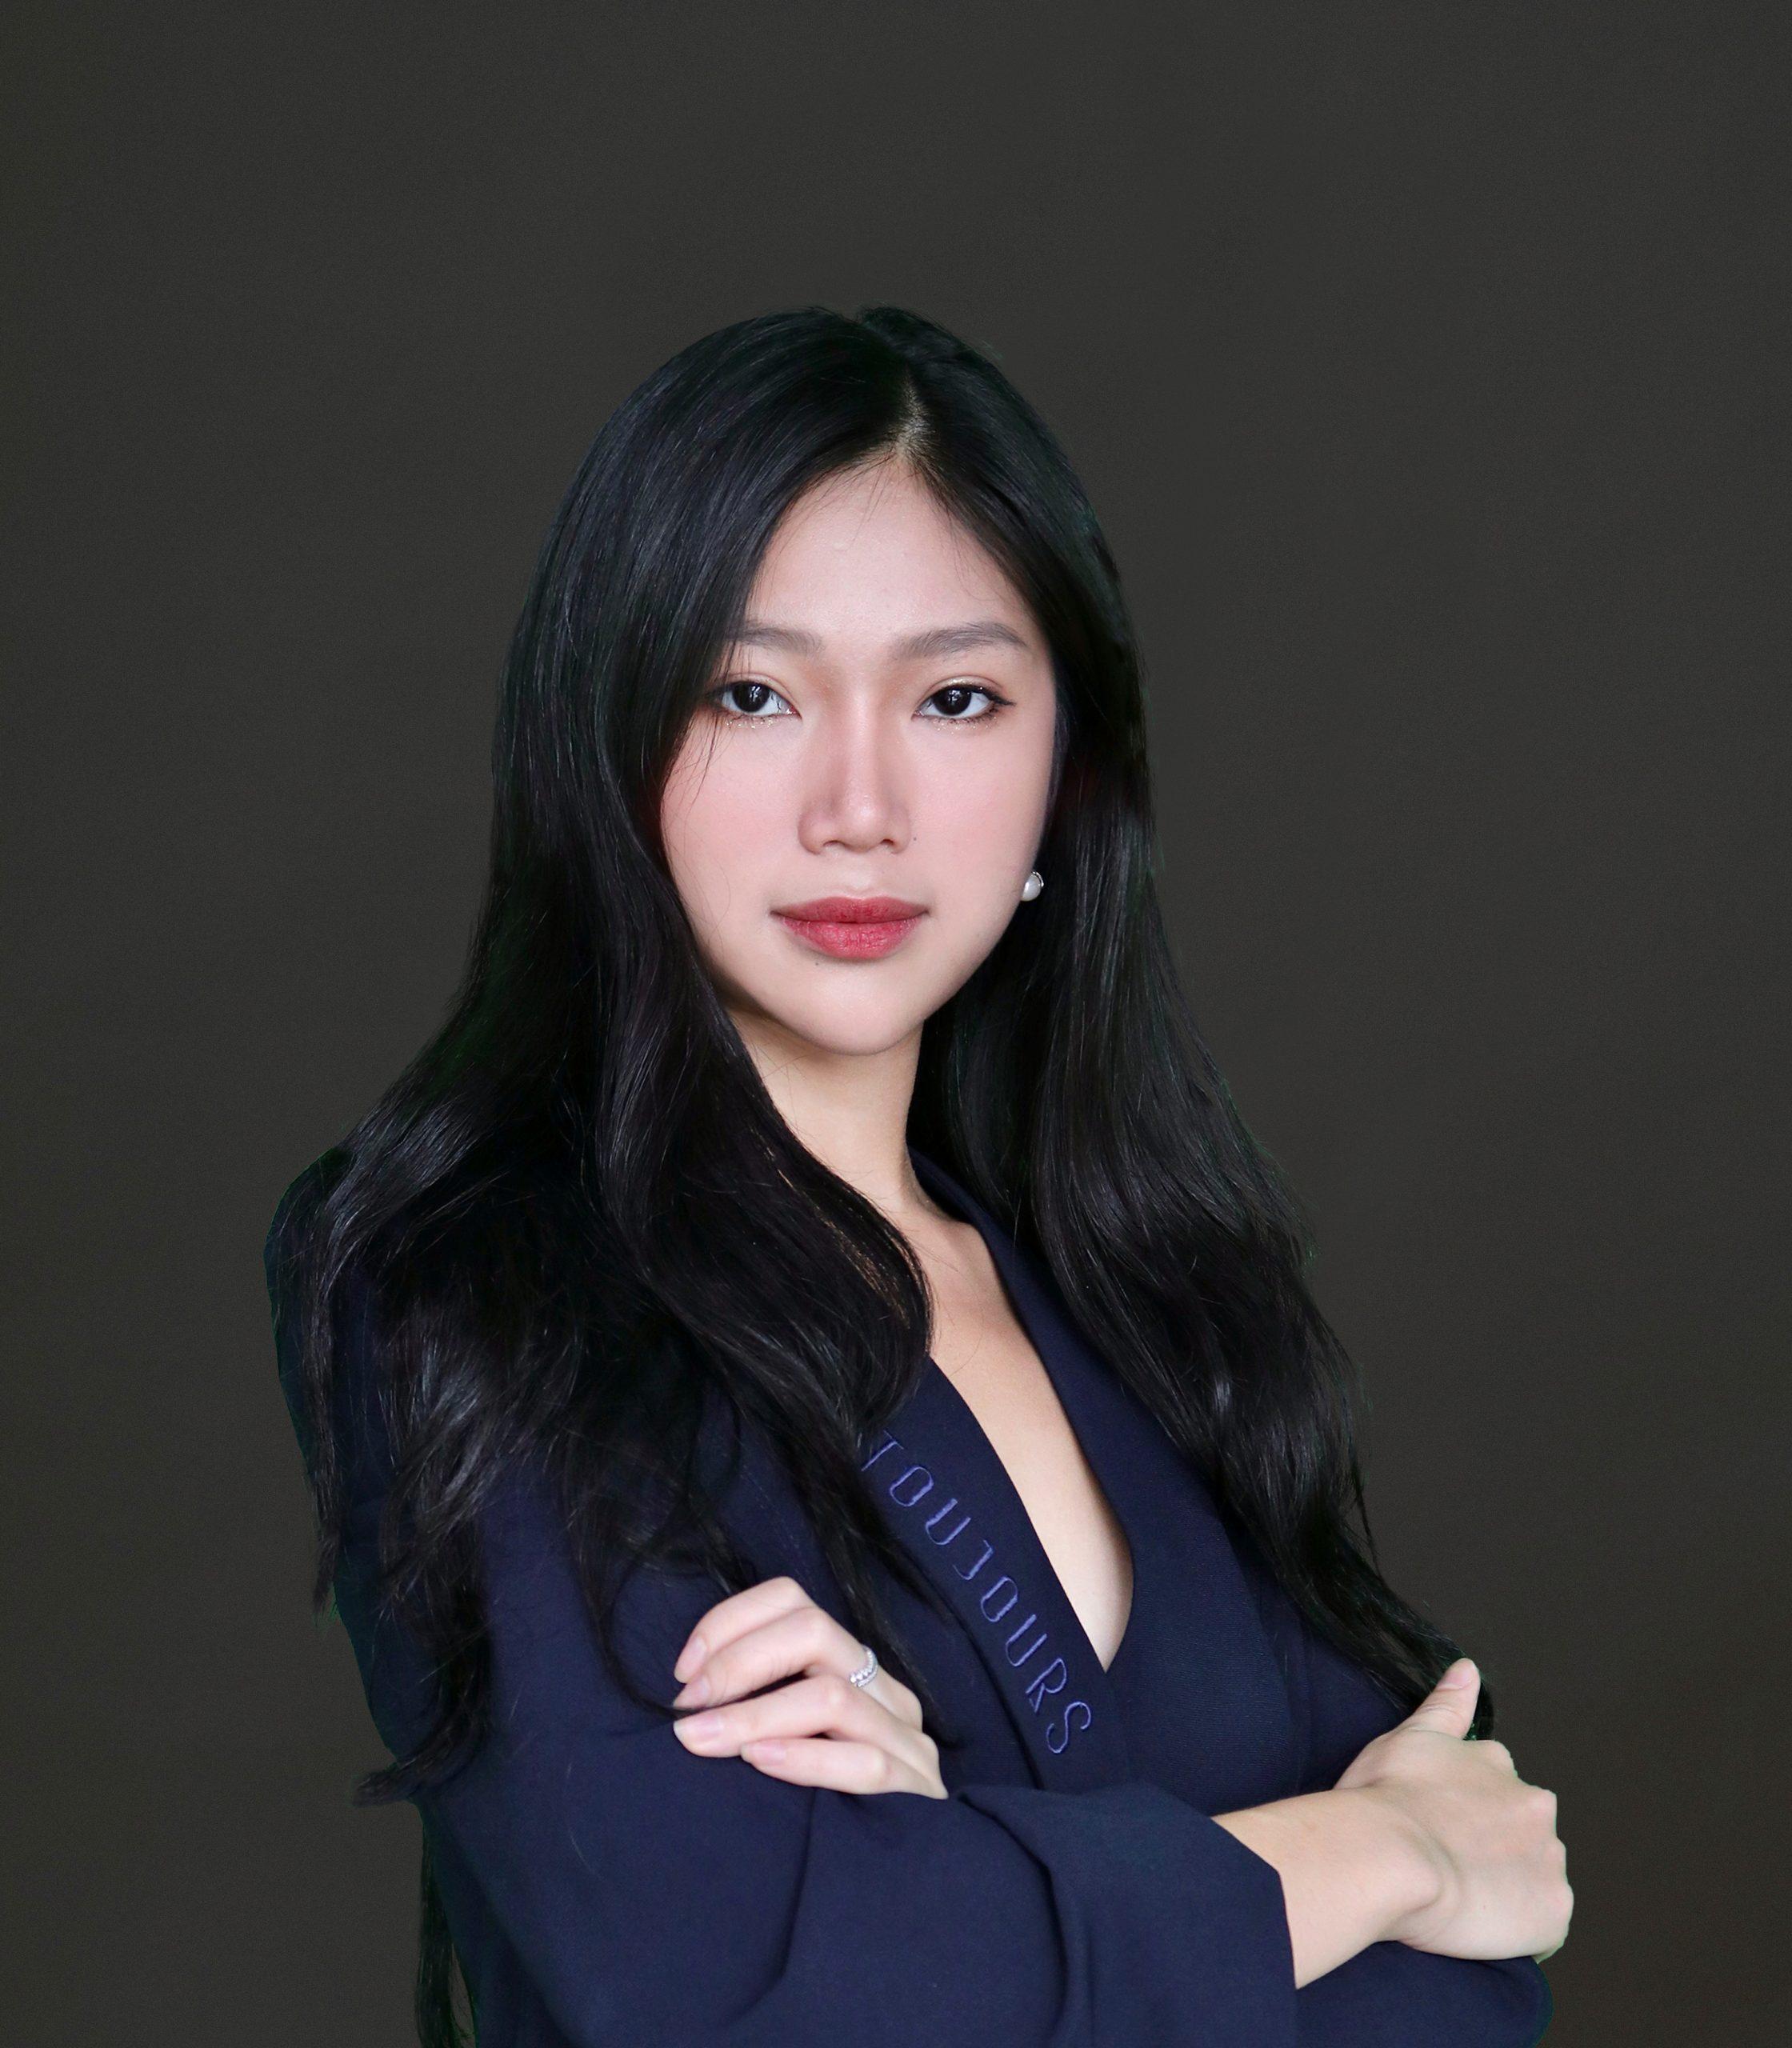 Trung Hoa – PARTNER MANAGER